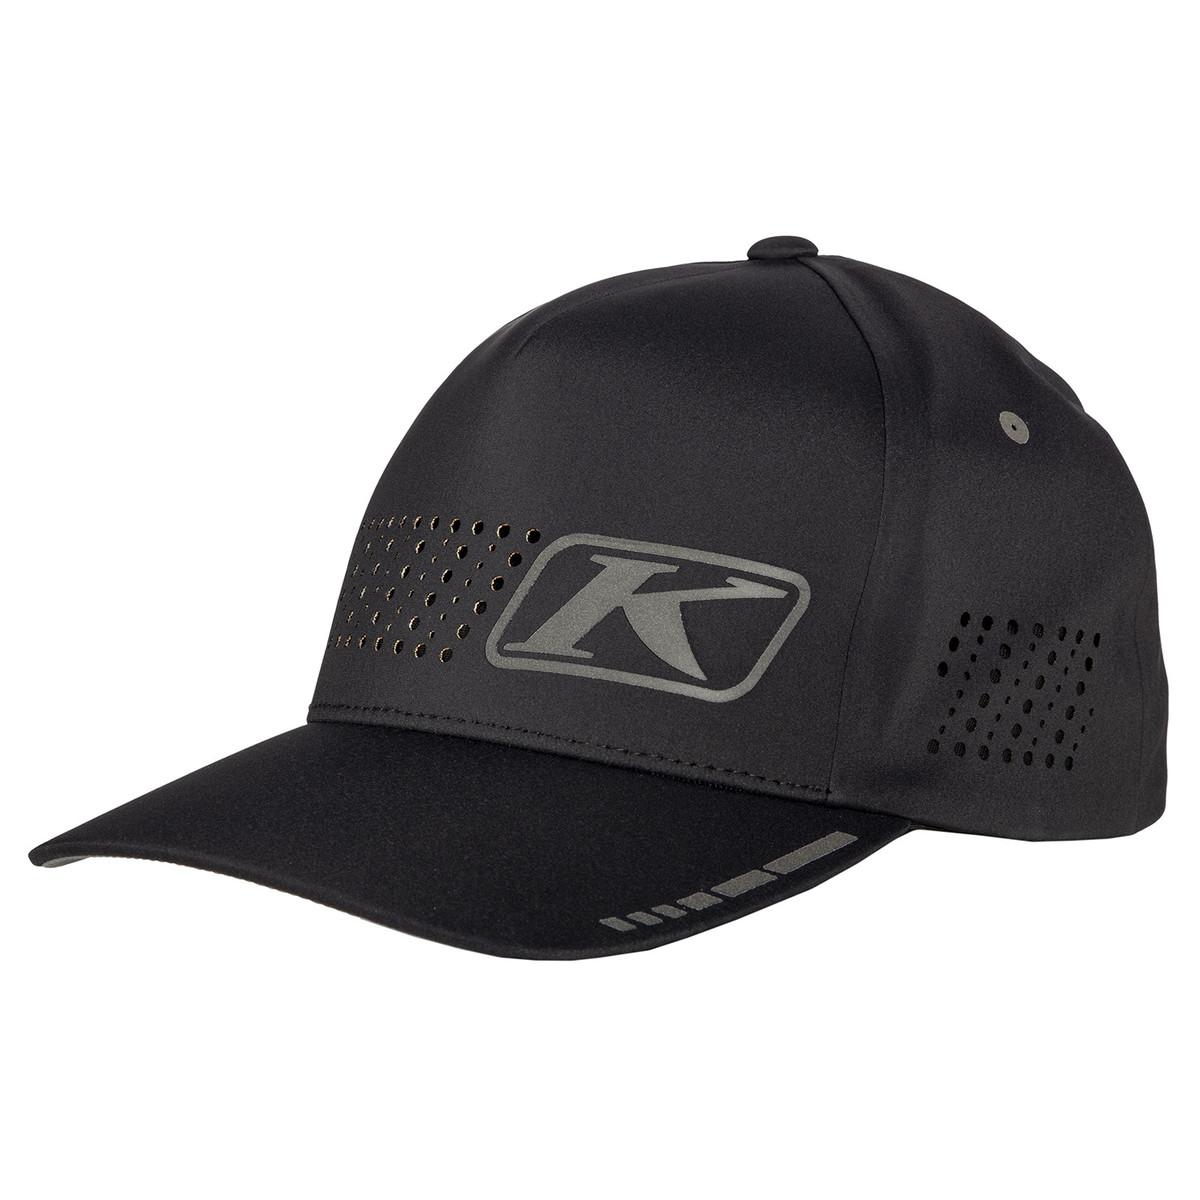 a3f40ab49d35ac Tech Rider Hat. $34.99. Black